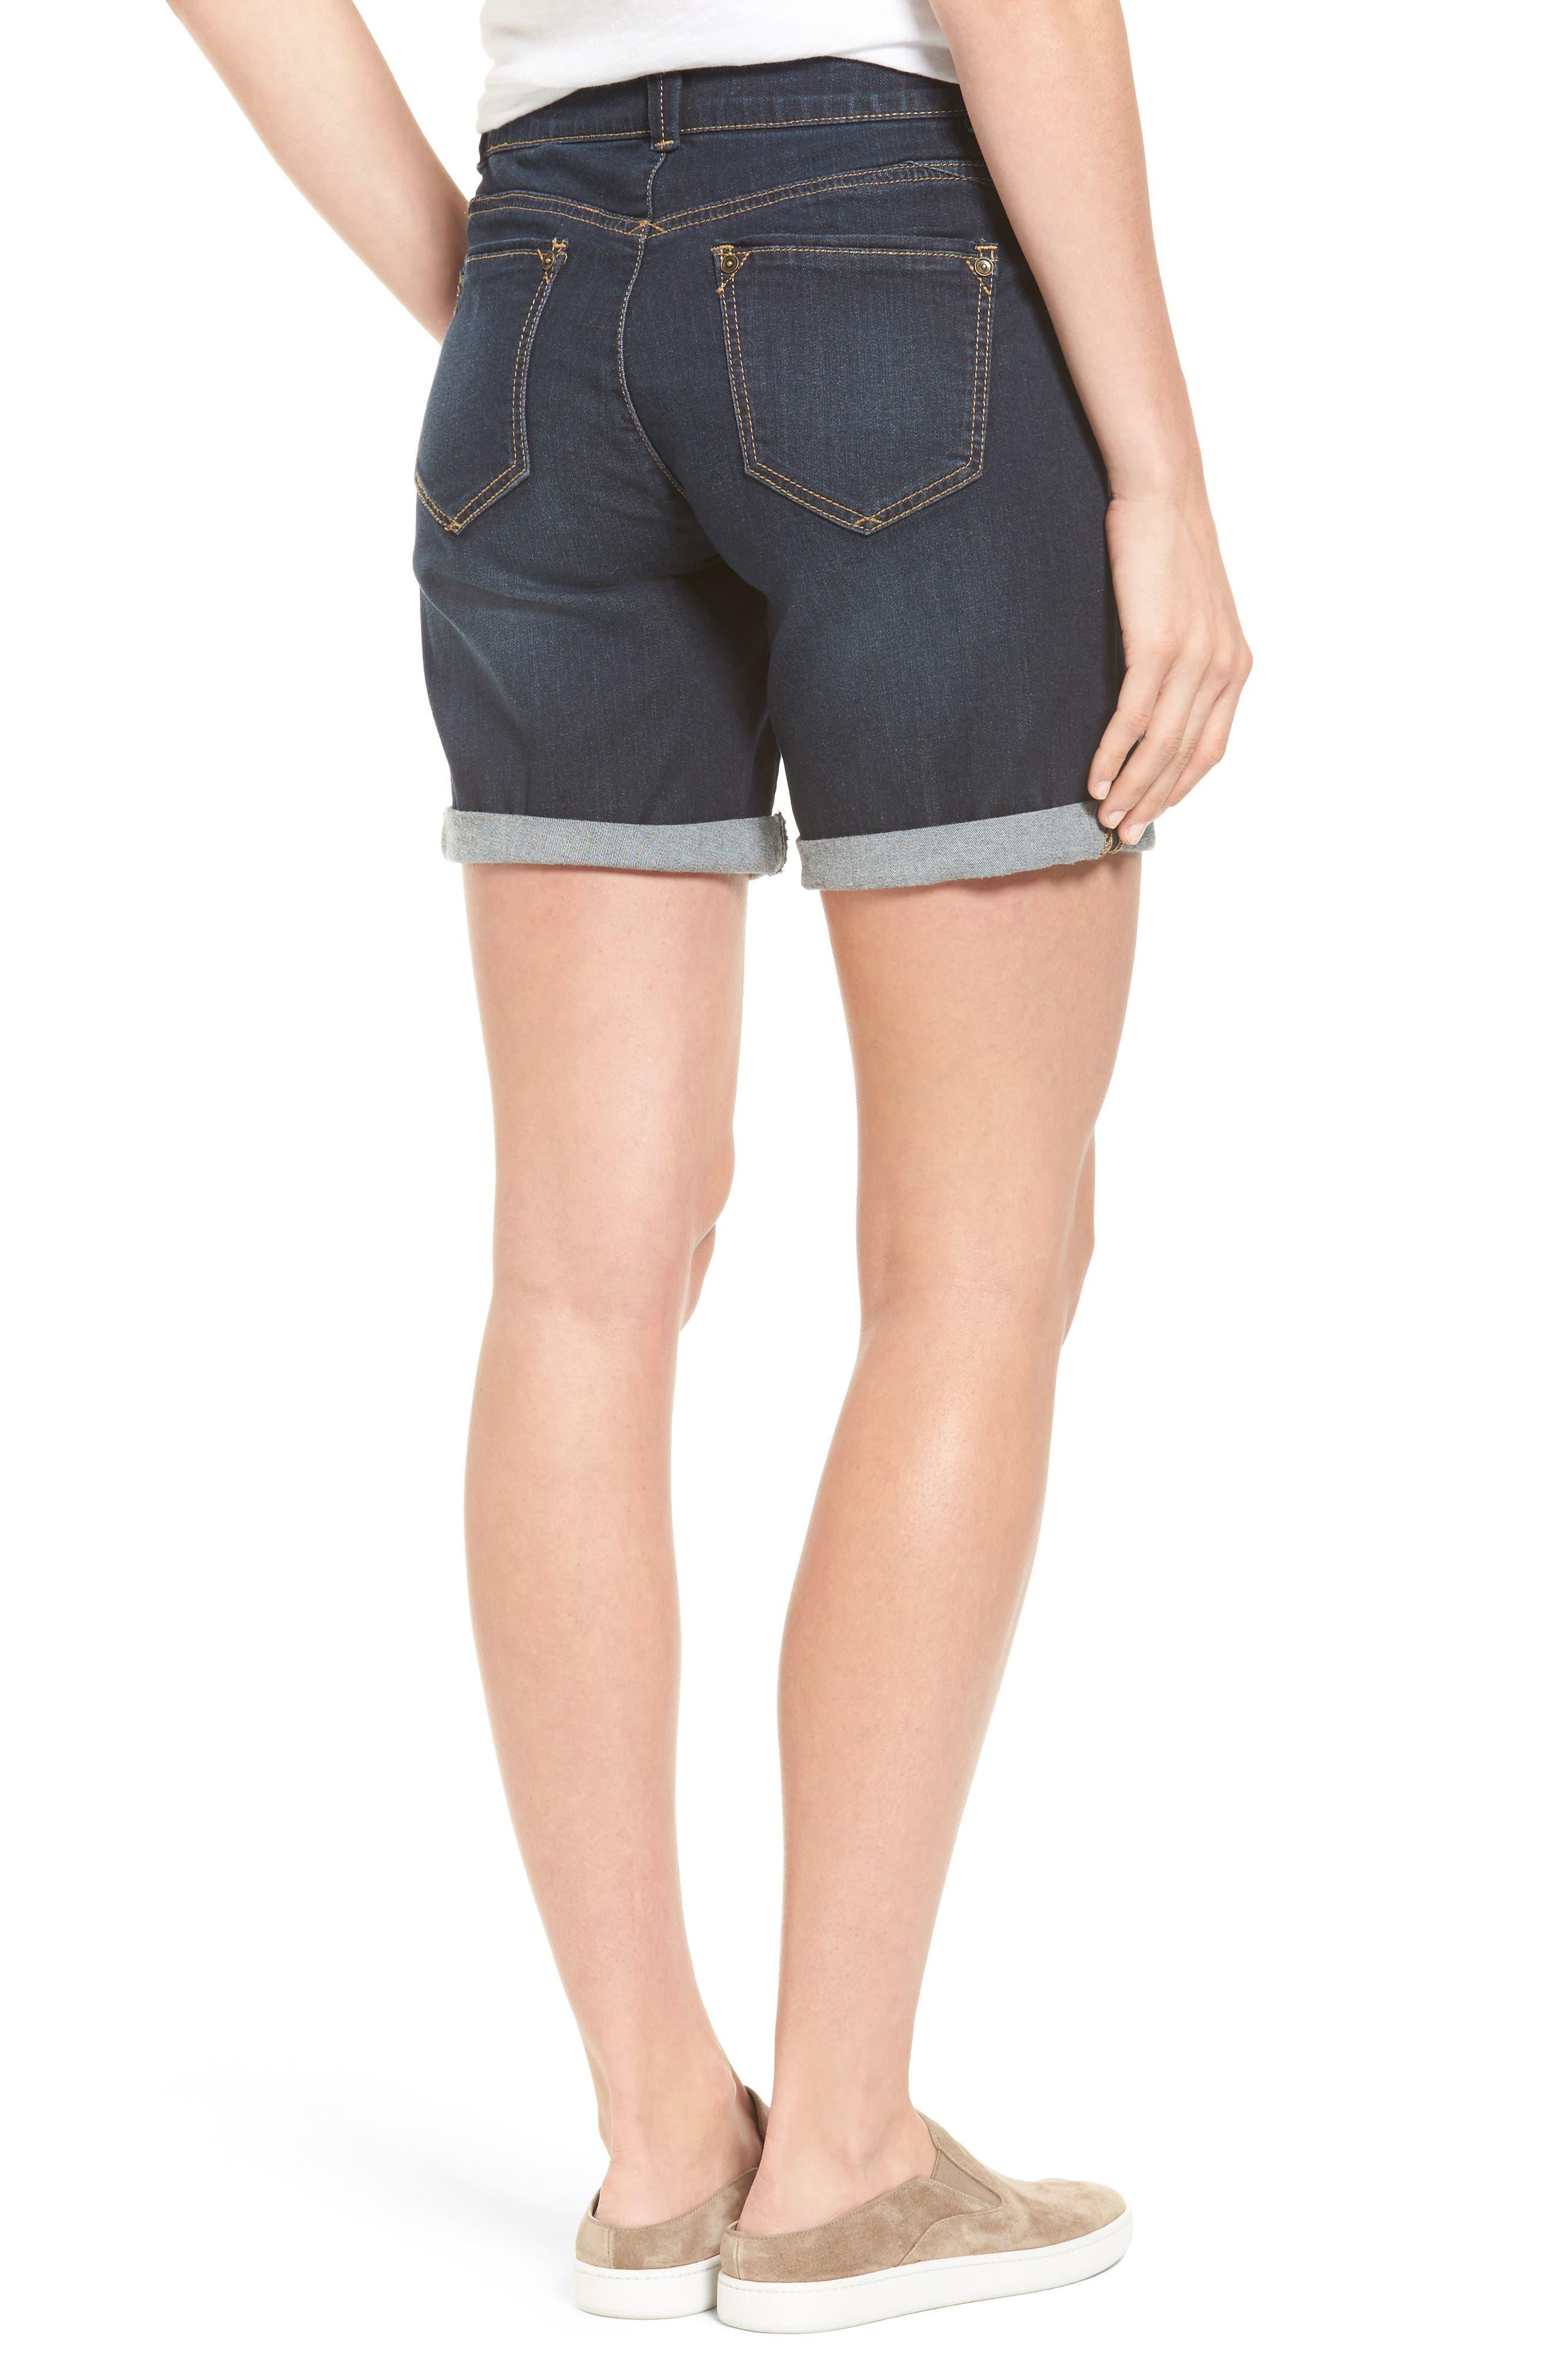 Ab-solution Cuffed Denim Shorts,                             Alternate thumbnail 2, color,                             402